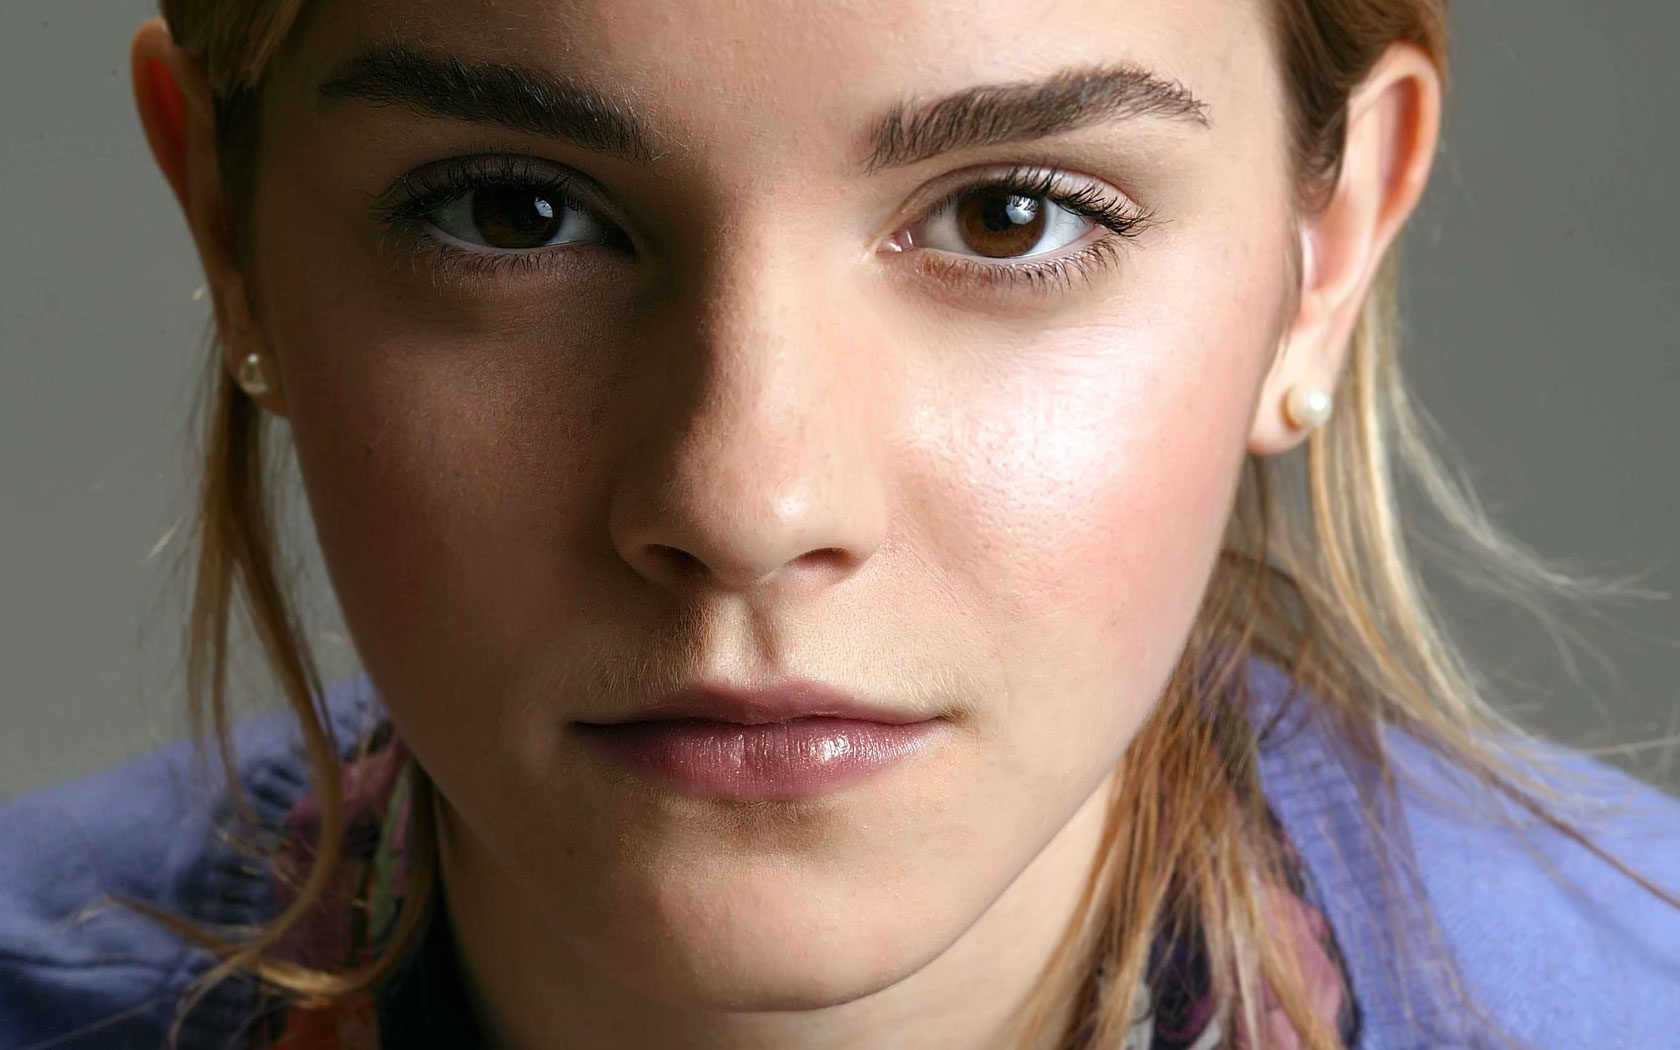 Emma watson face hd